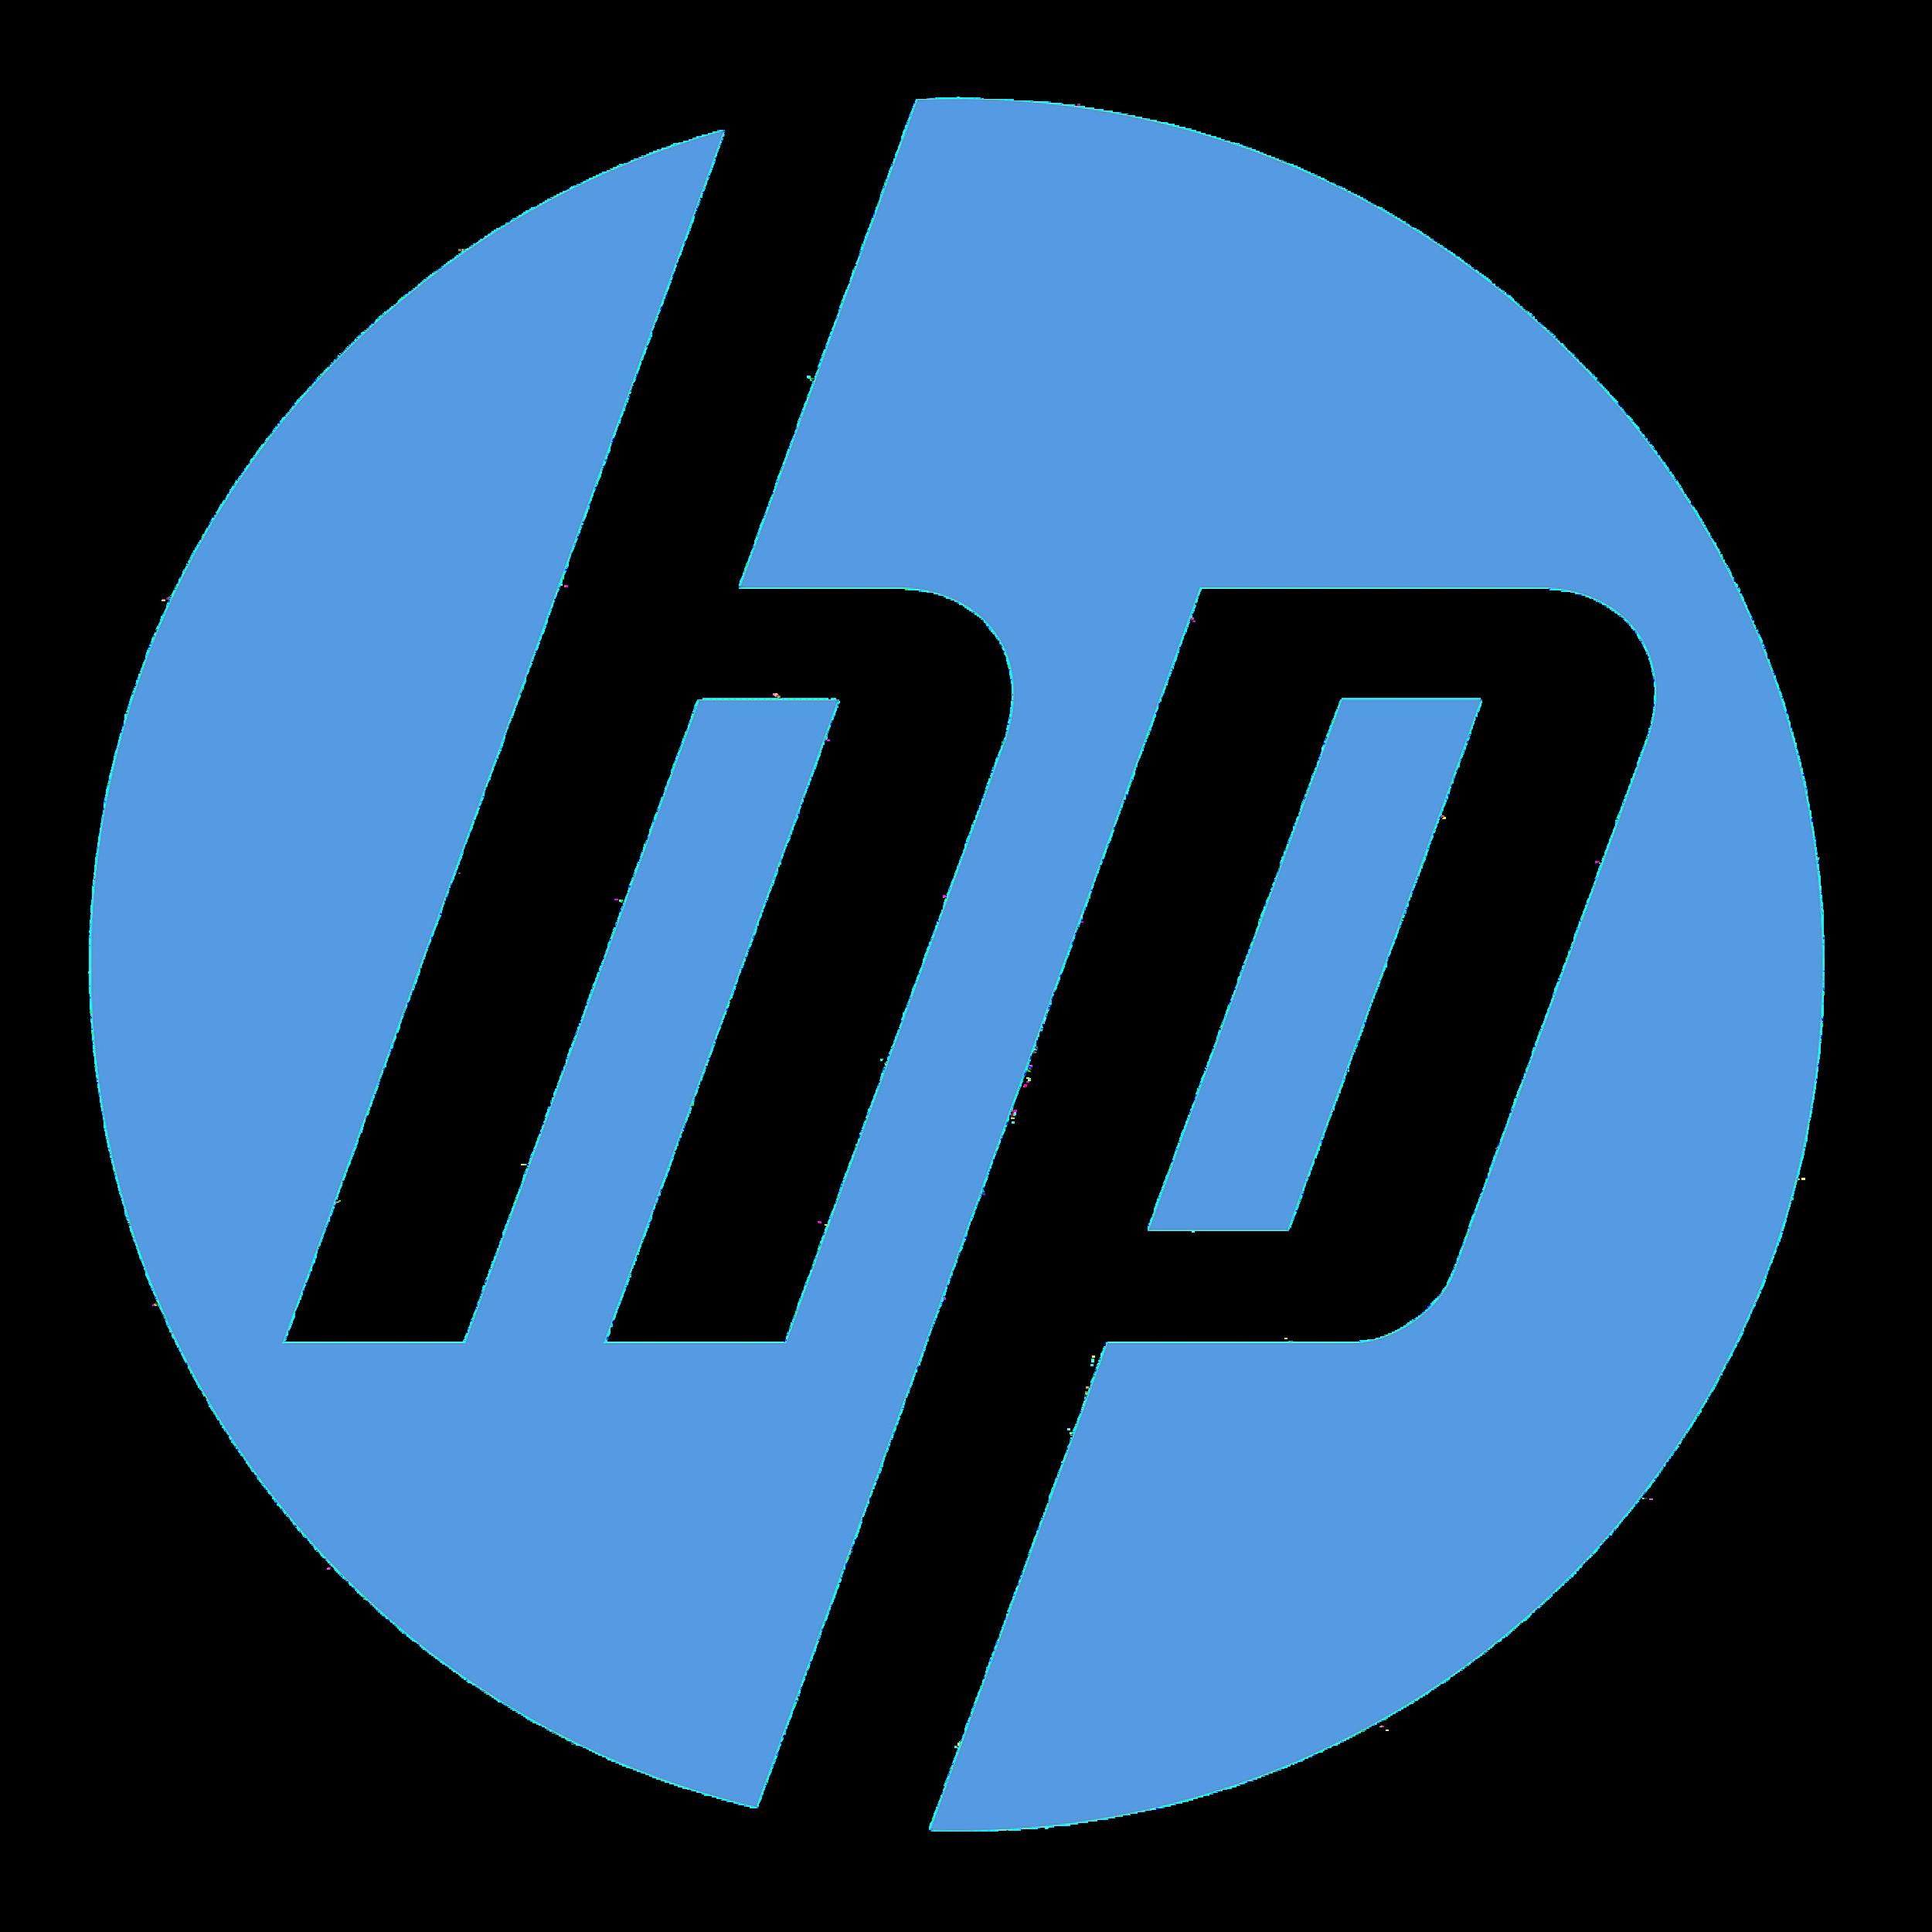 purepng.com-hp-logologobrand-logoiconslogos-2515199390657l82v.png